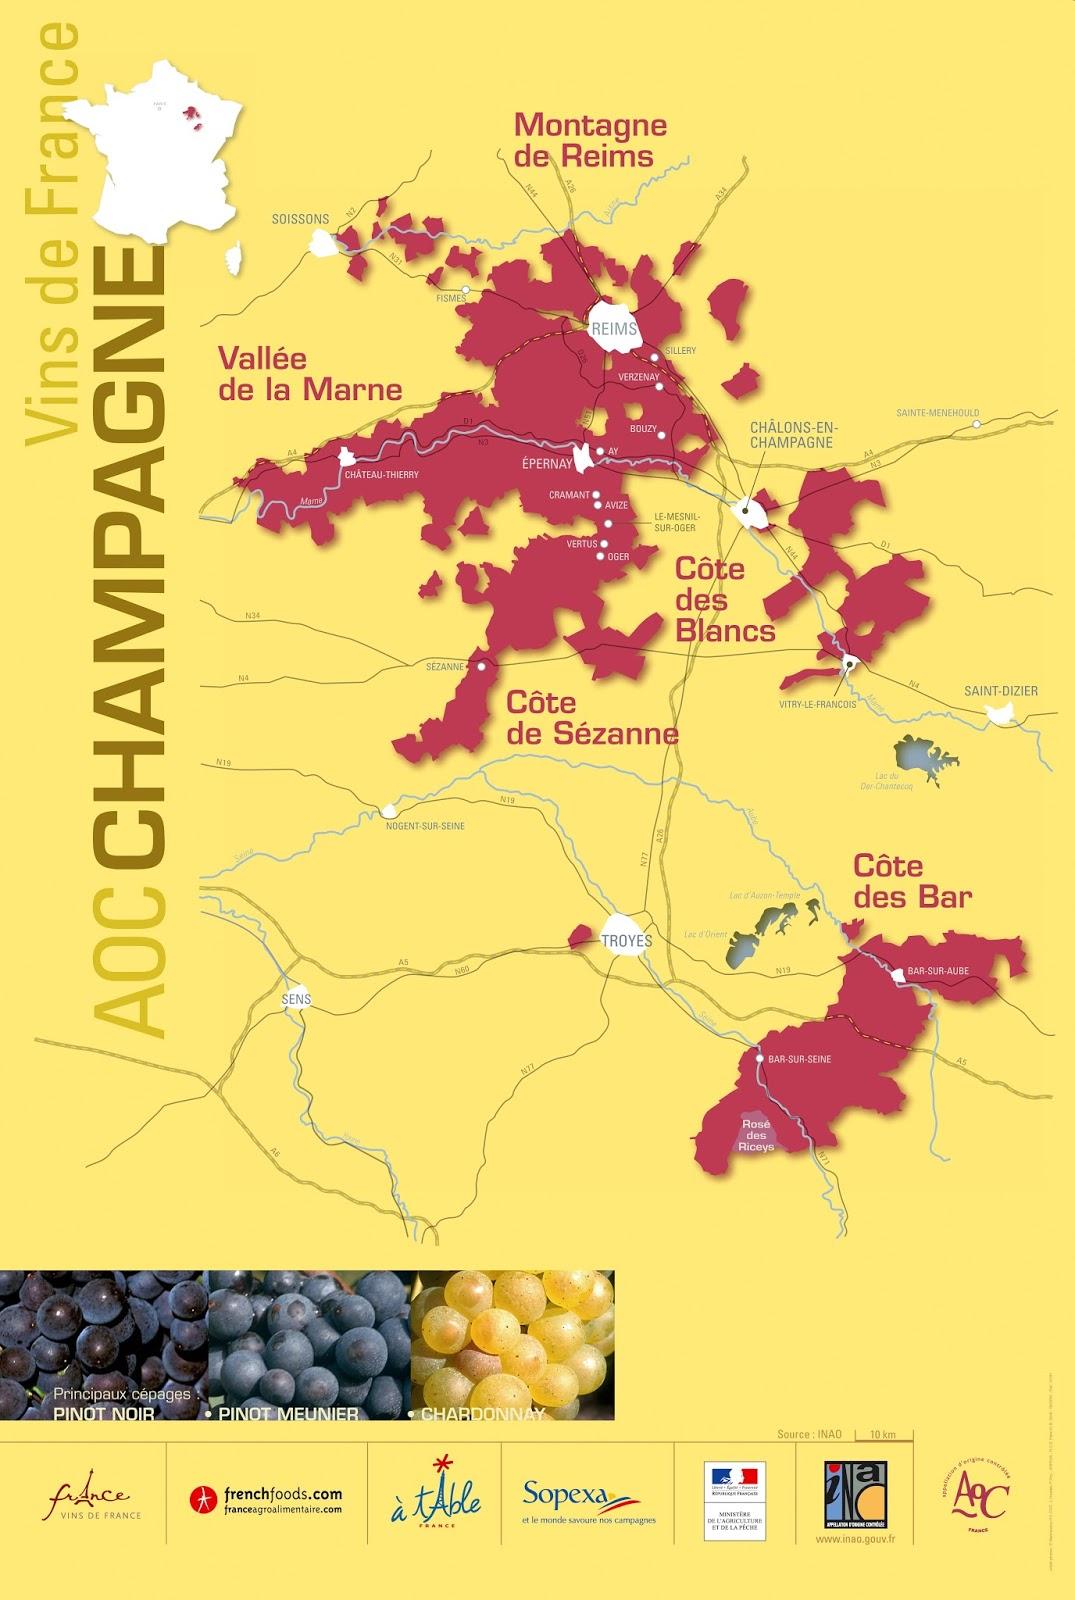 Schiller wine champagne jean josselin in gy sur seine for Champagne region in france